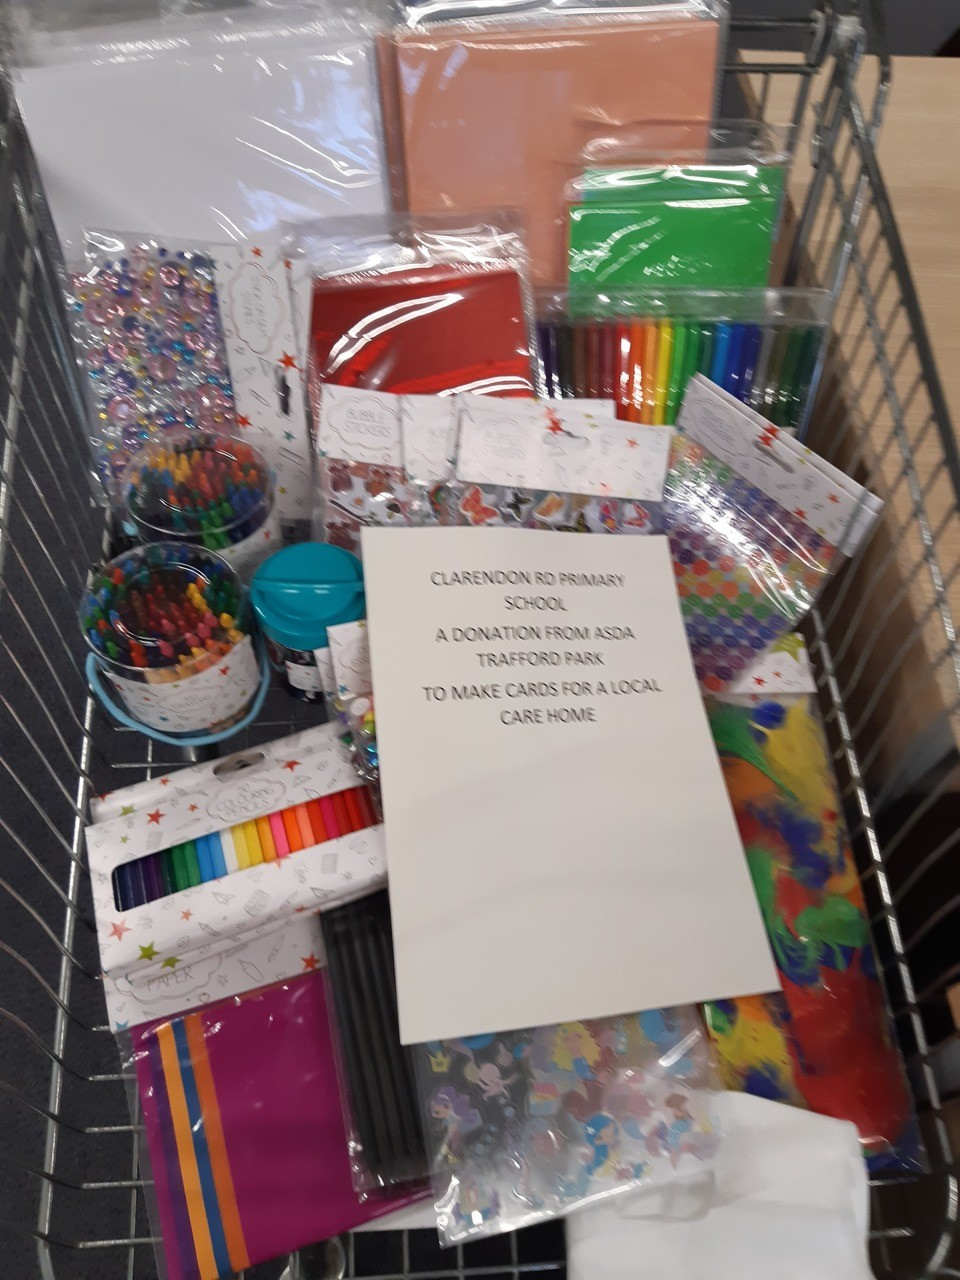 Donation for Clarendon Rd Primary school | Asda Trafford Park